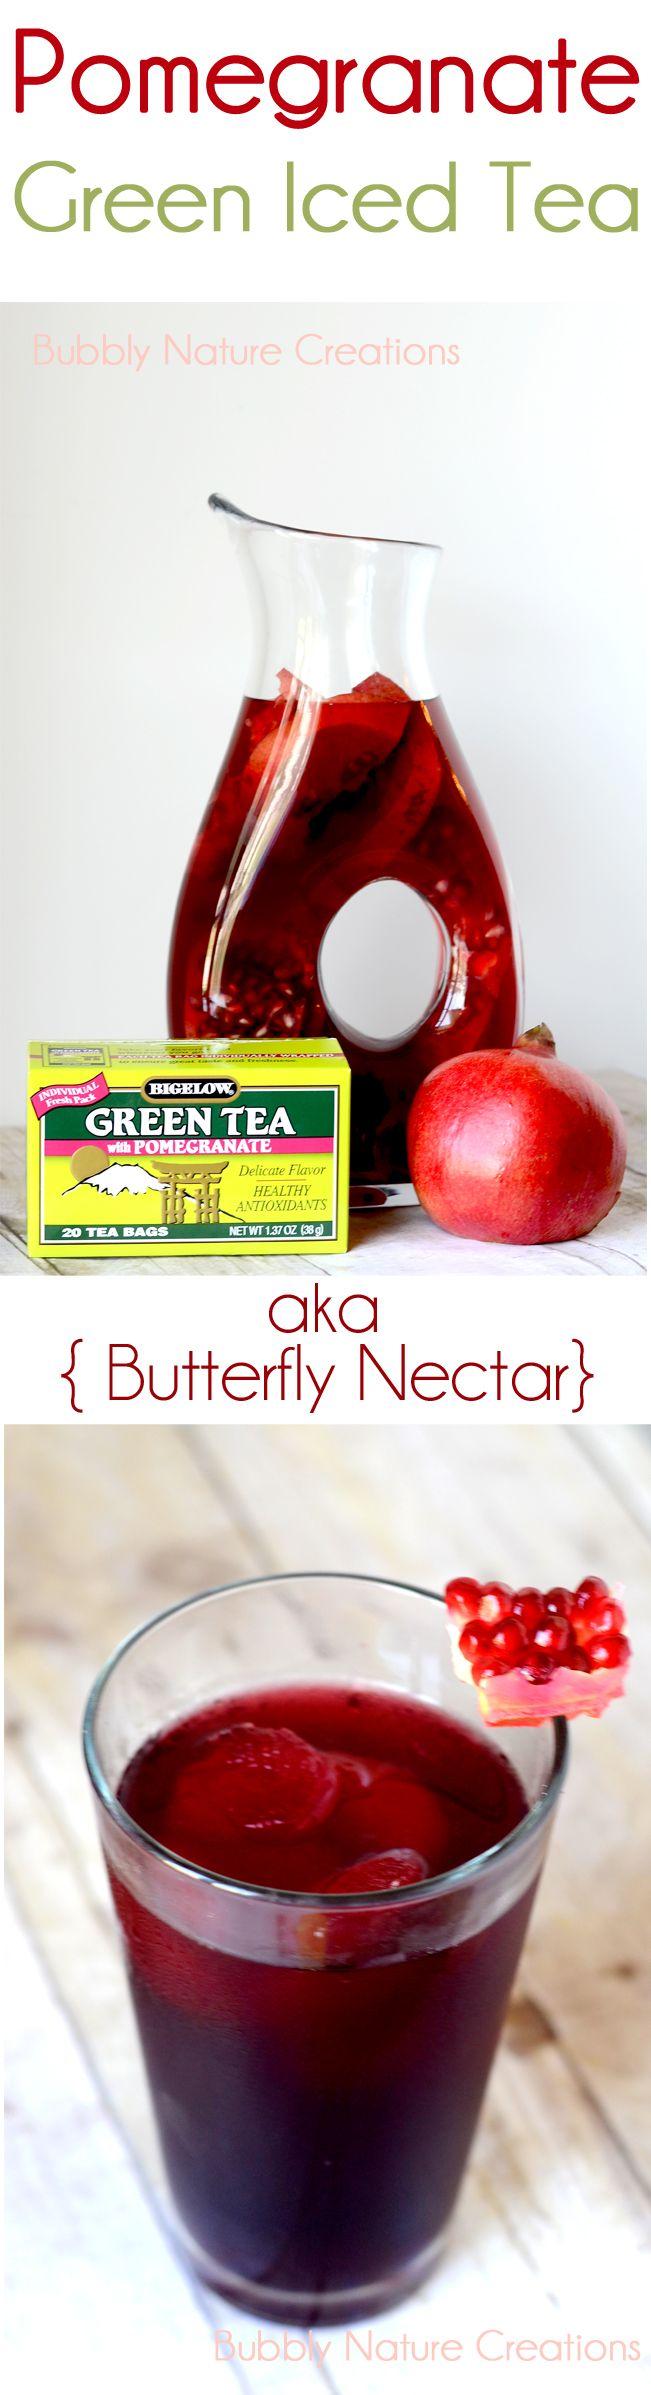 Pomegranate Green Iced Tea aka (Butterfly Nectar)